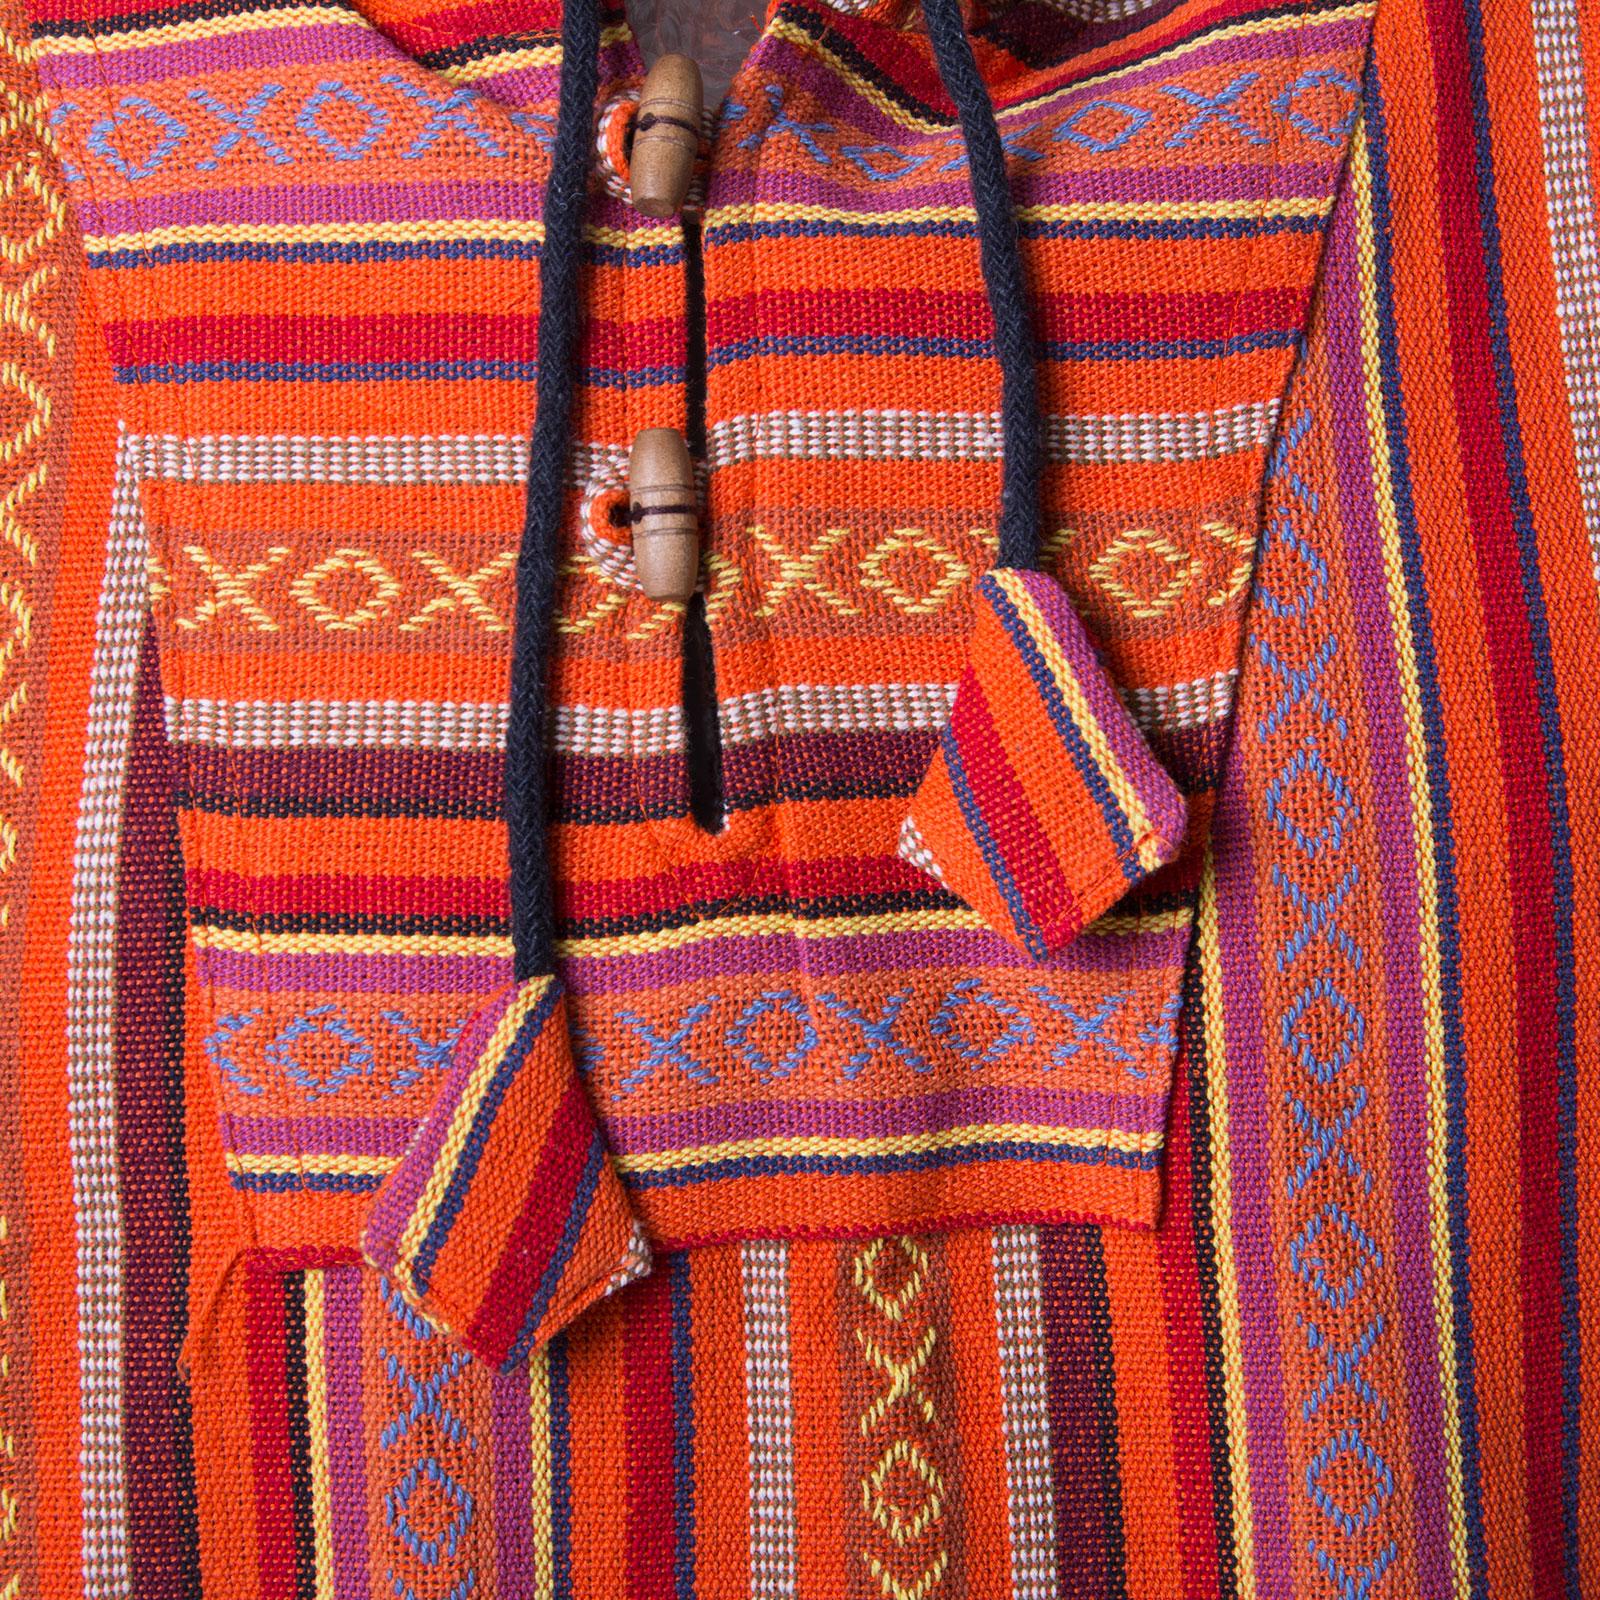 2b2c164022ef23 Kunst Und Magie Men's Nepal Baja Hoodie Jumper Sweatshirt Poncho | eBay